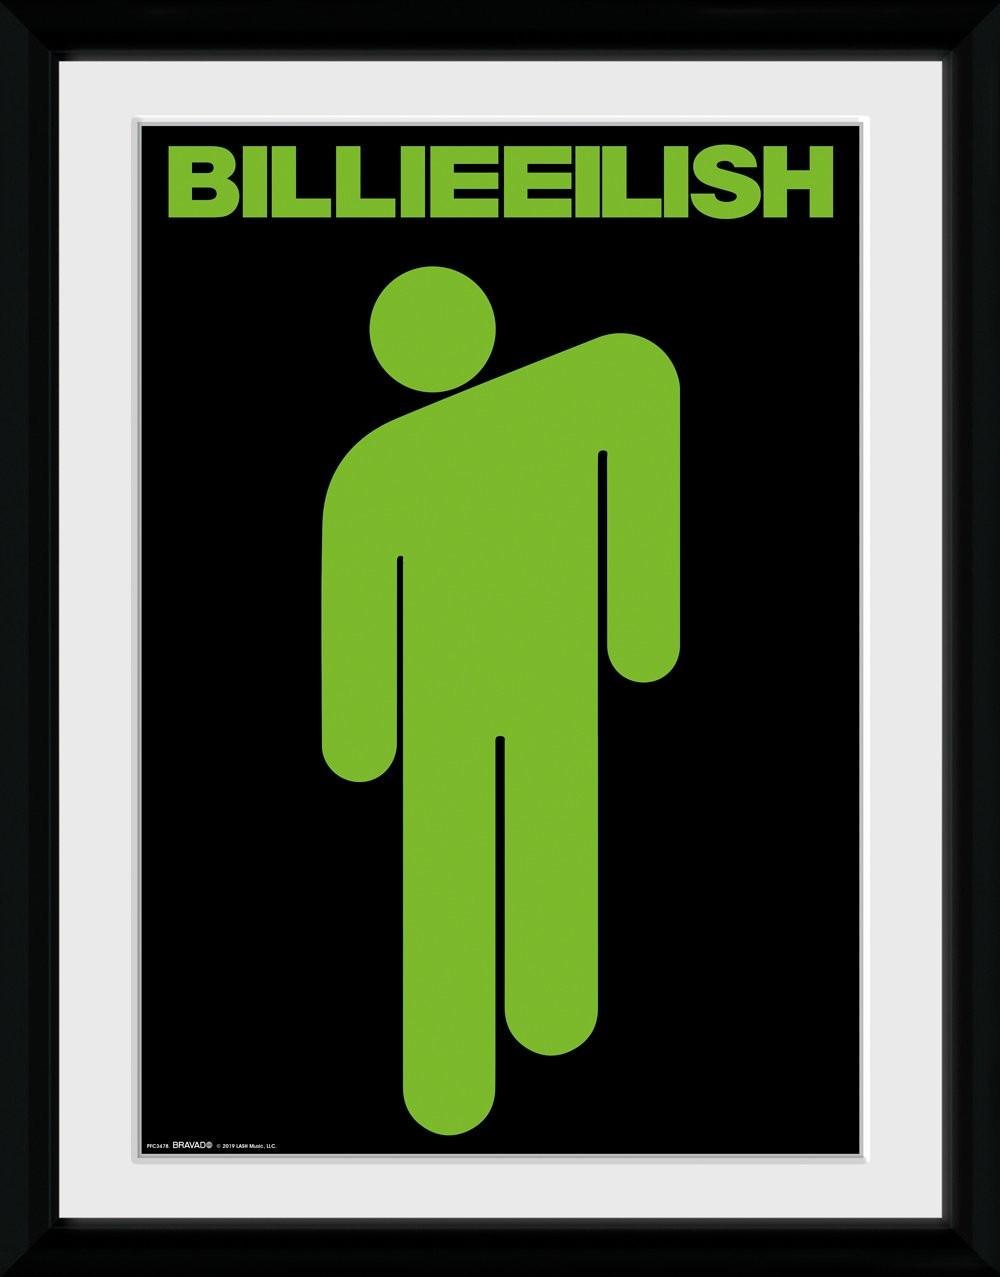 *IT-00258 Theissen Billie Eilish Stickman P/óster mate Frameless Gift 11 x 17 pulgadas 28 x 43 cm